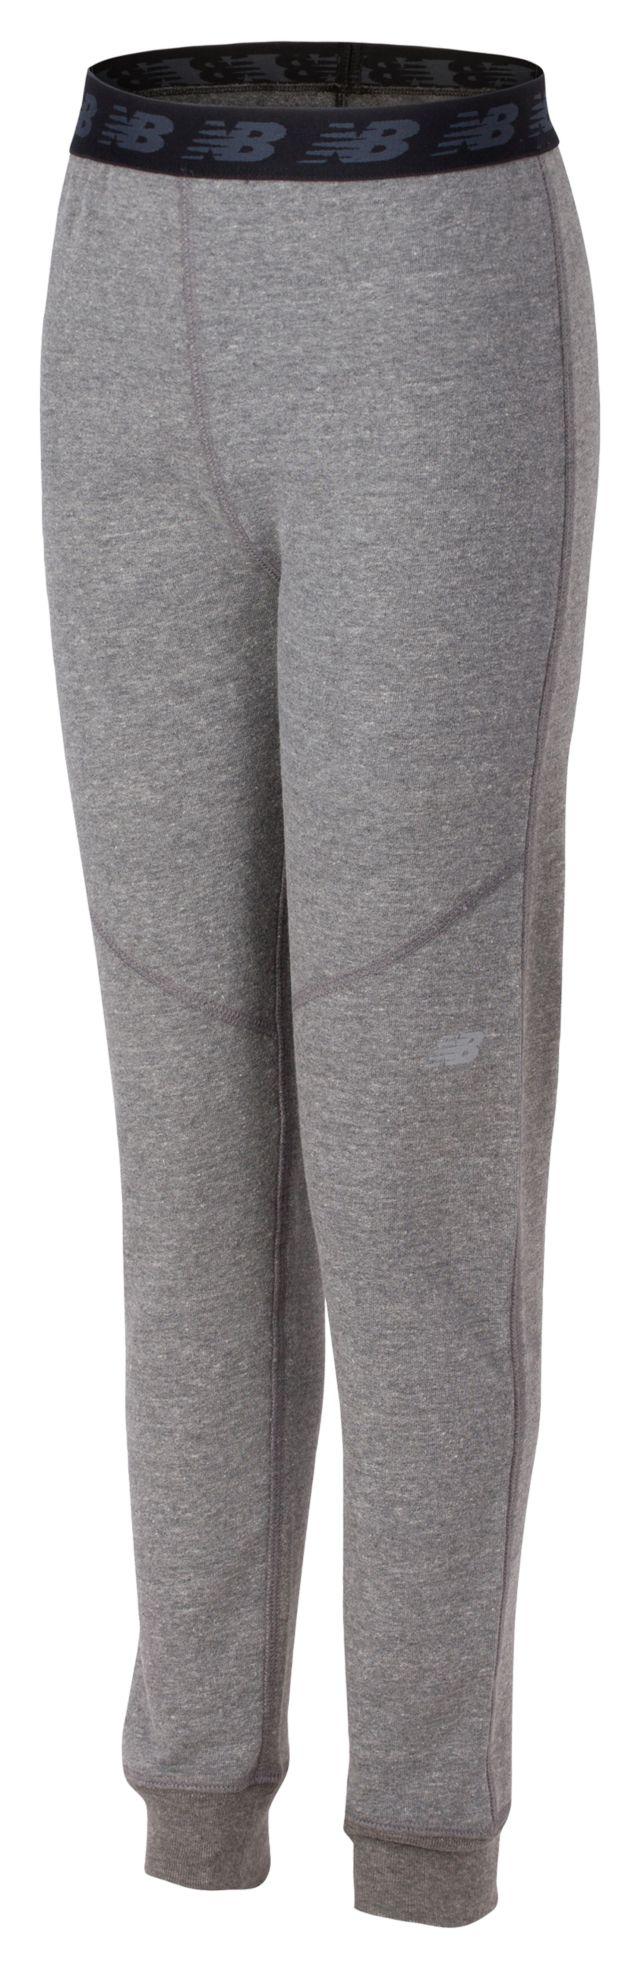 Kid's Micro Fleece Pant